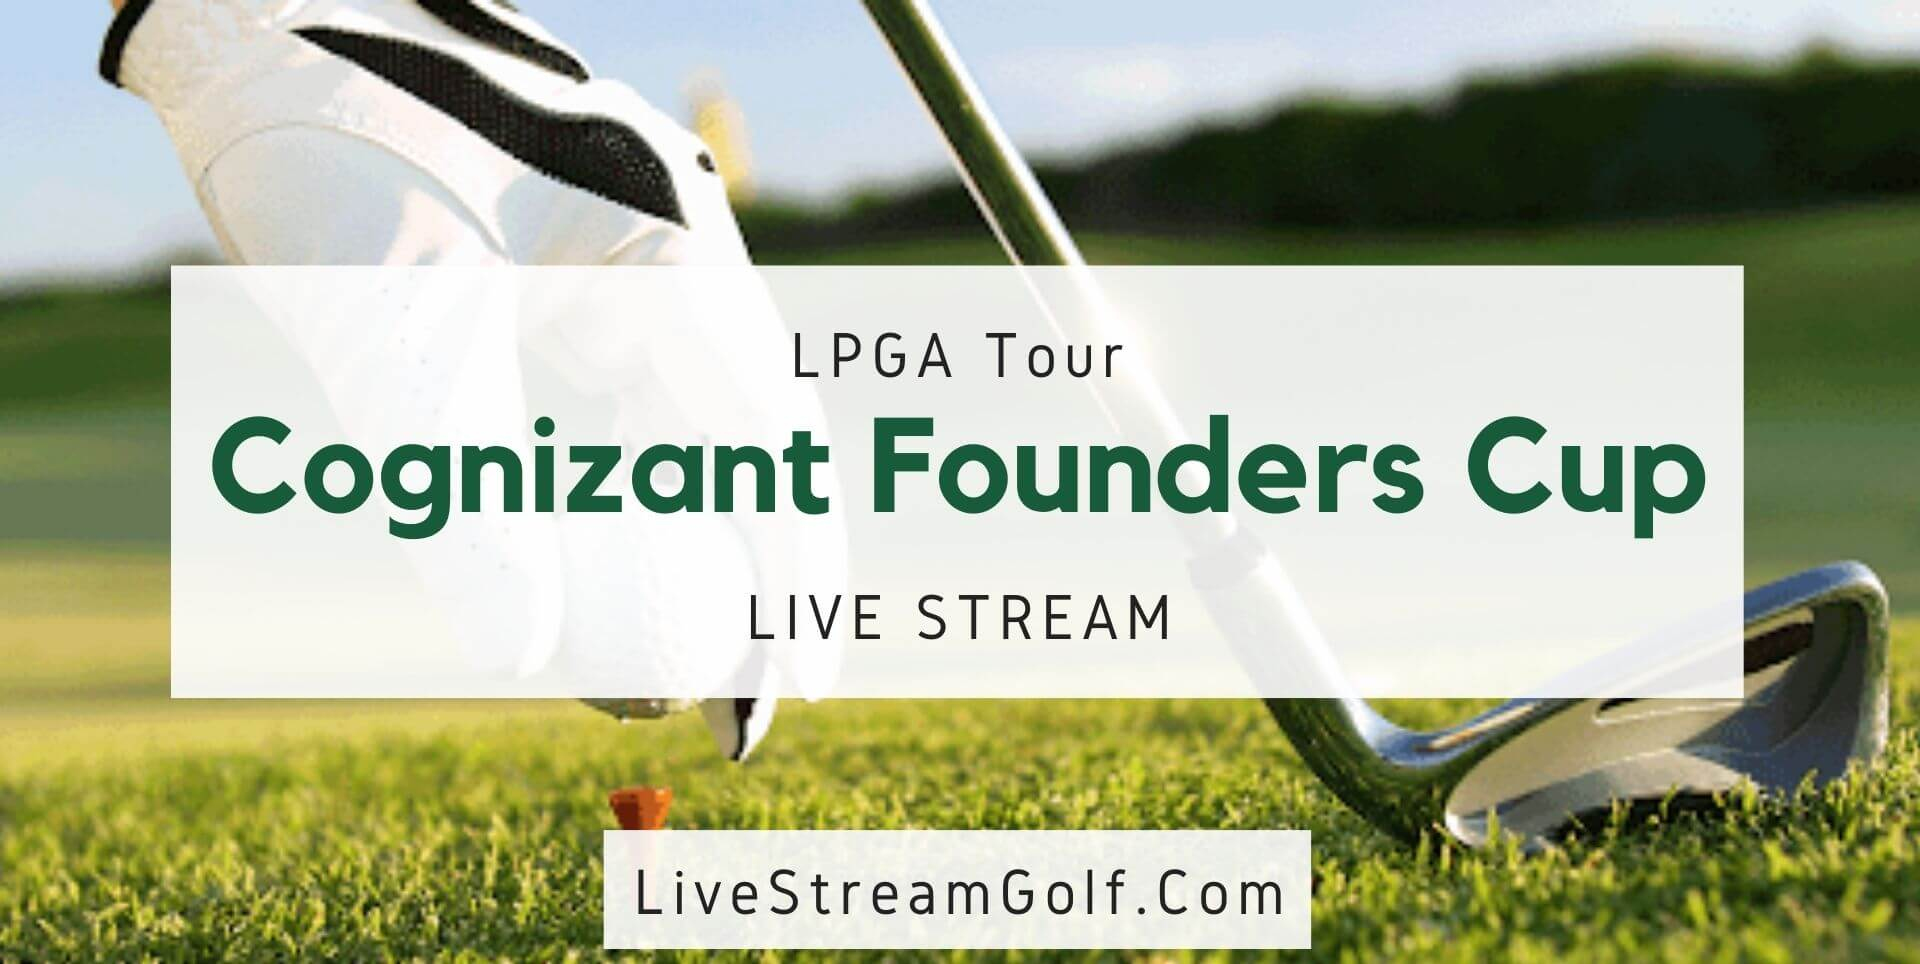 Cognizant Founders Cup Rd 3 Live Stream: LPGA Tour 2021